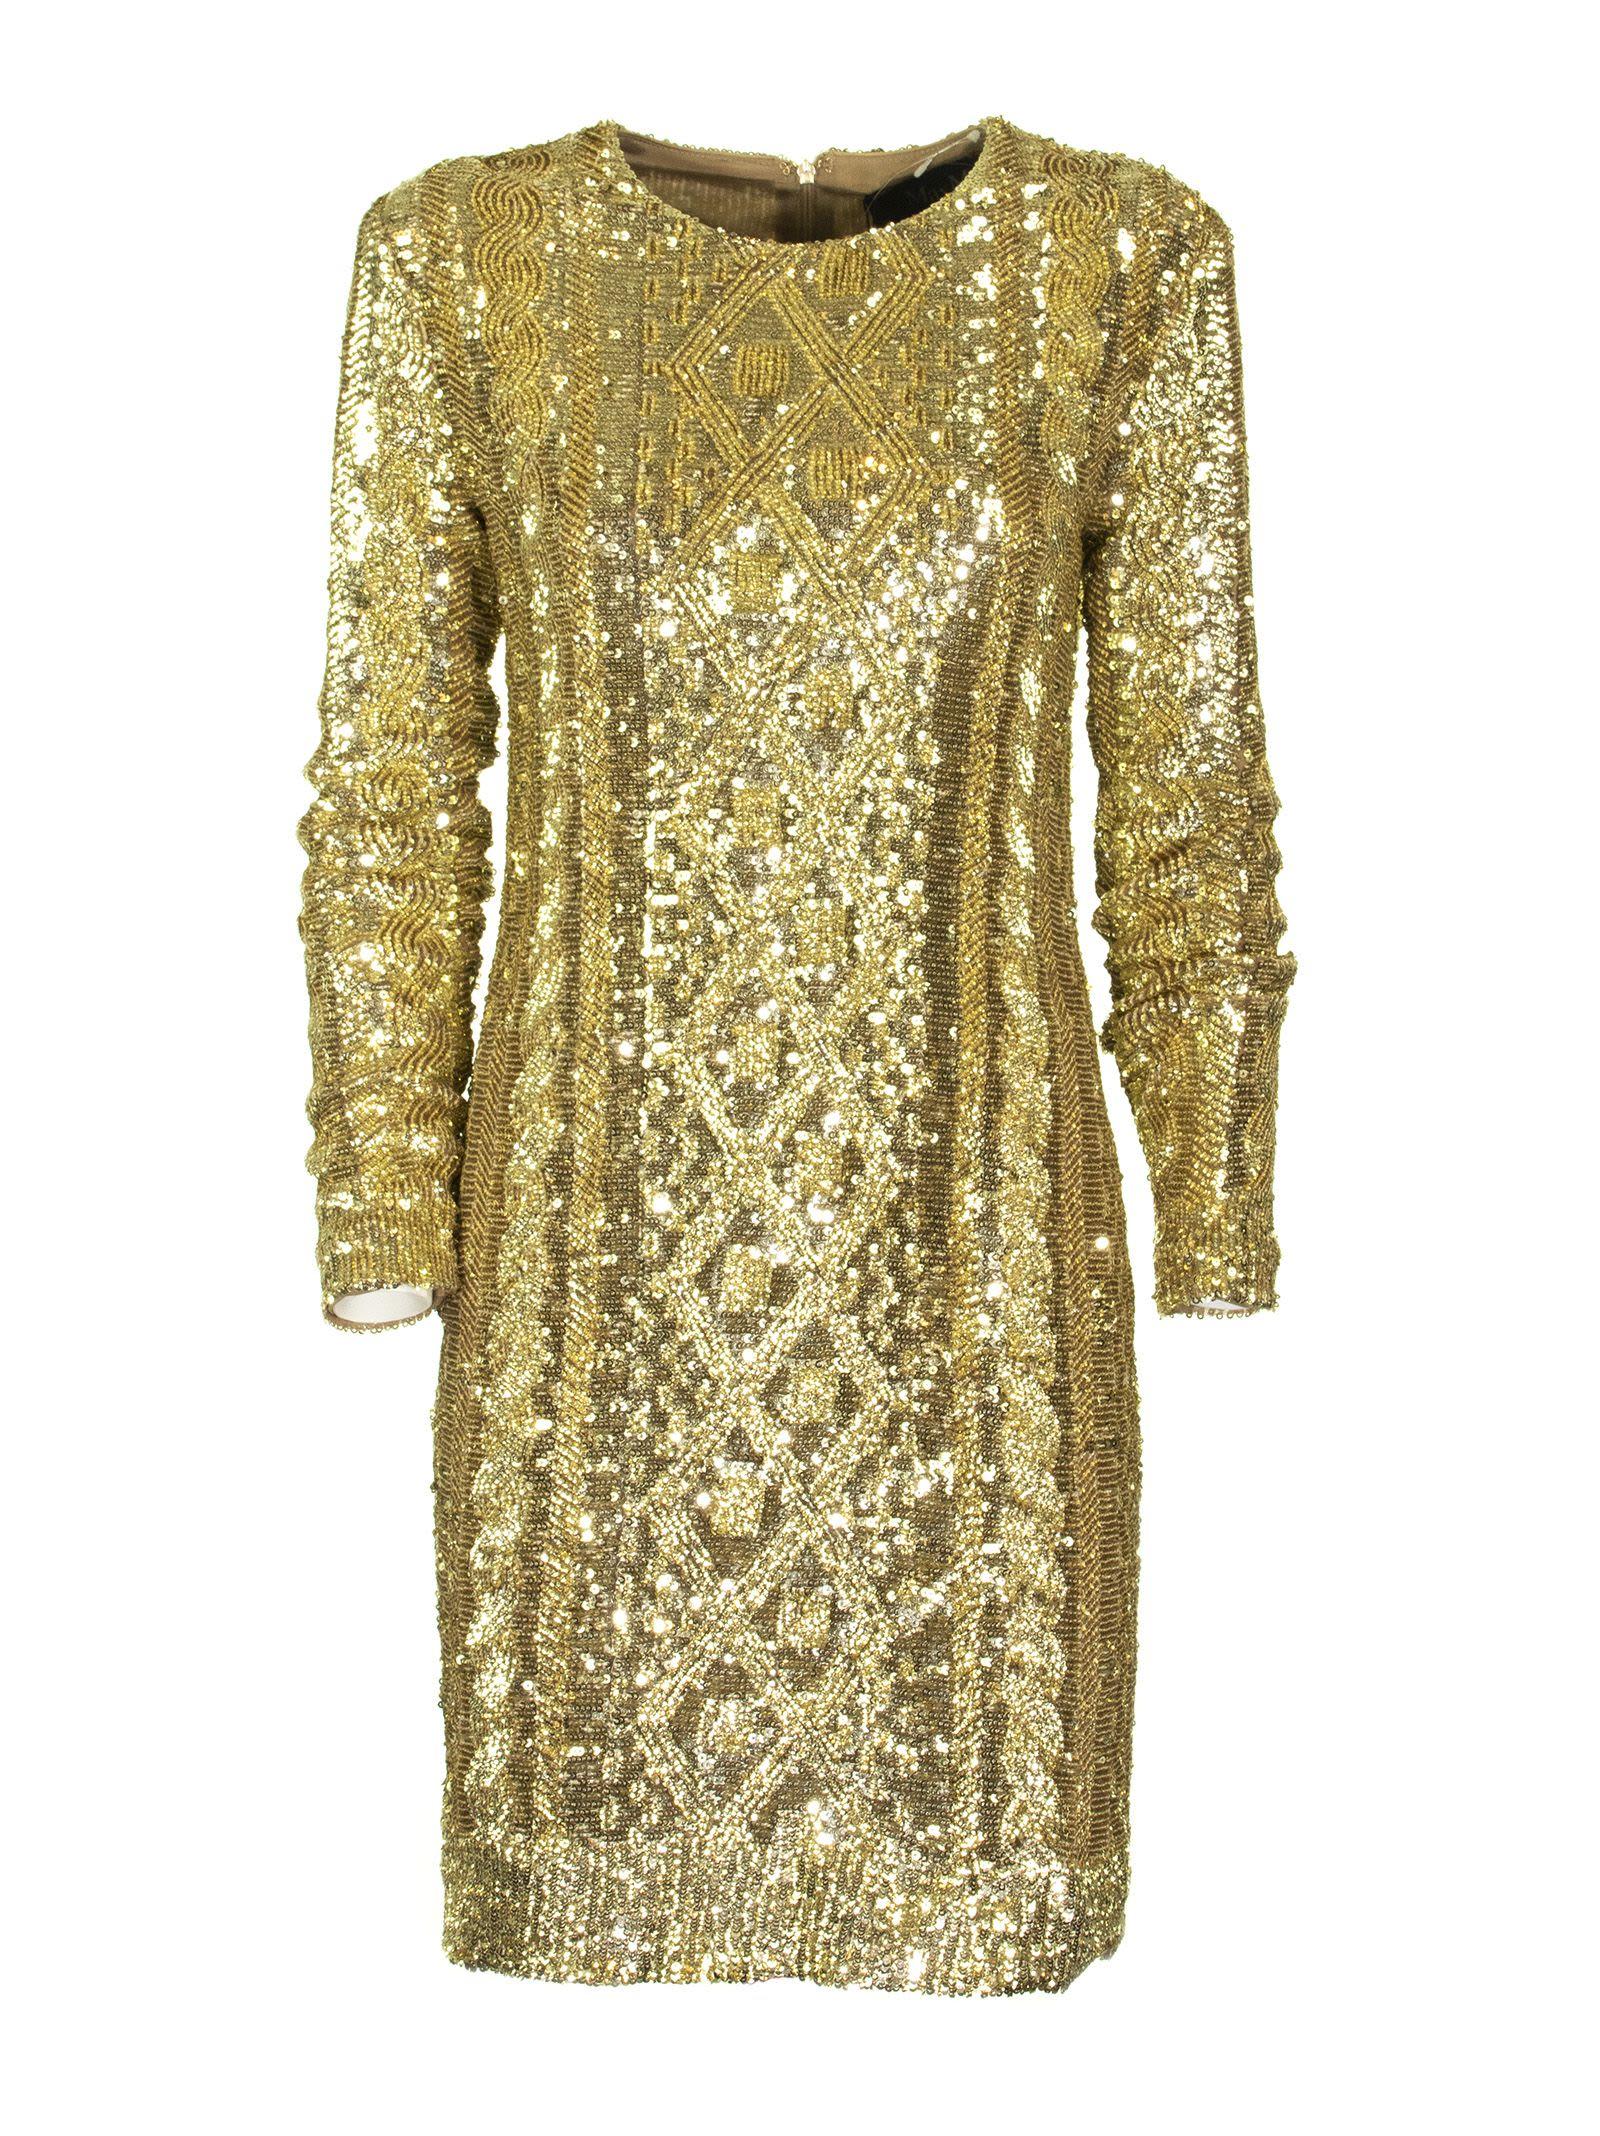 Max Mara Gold Dress